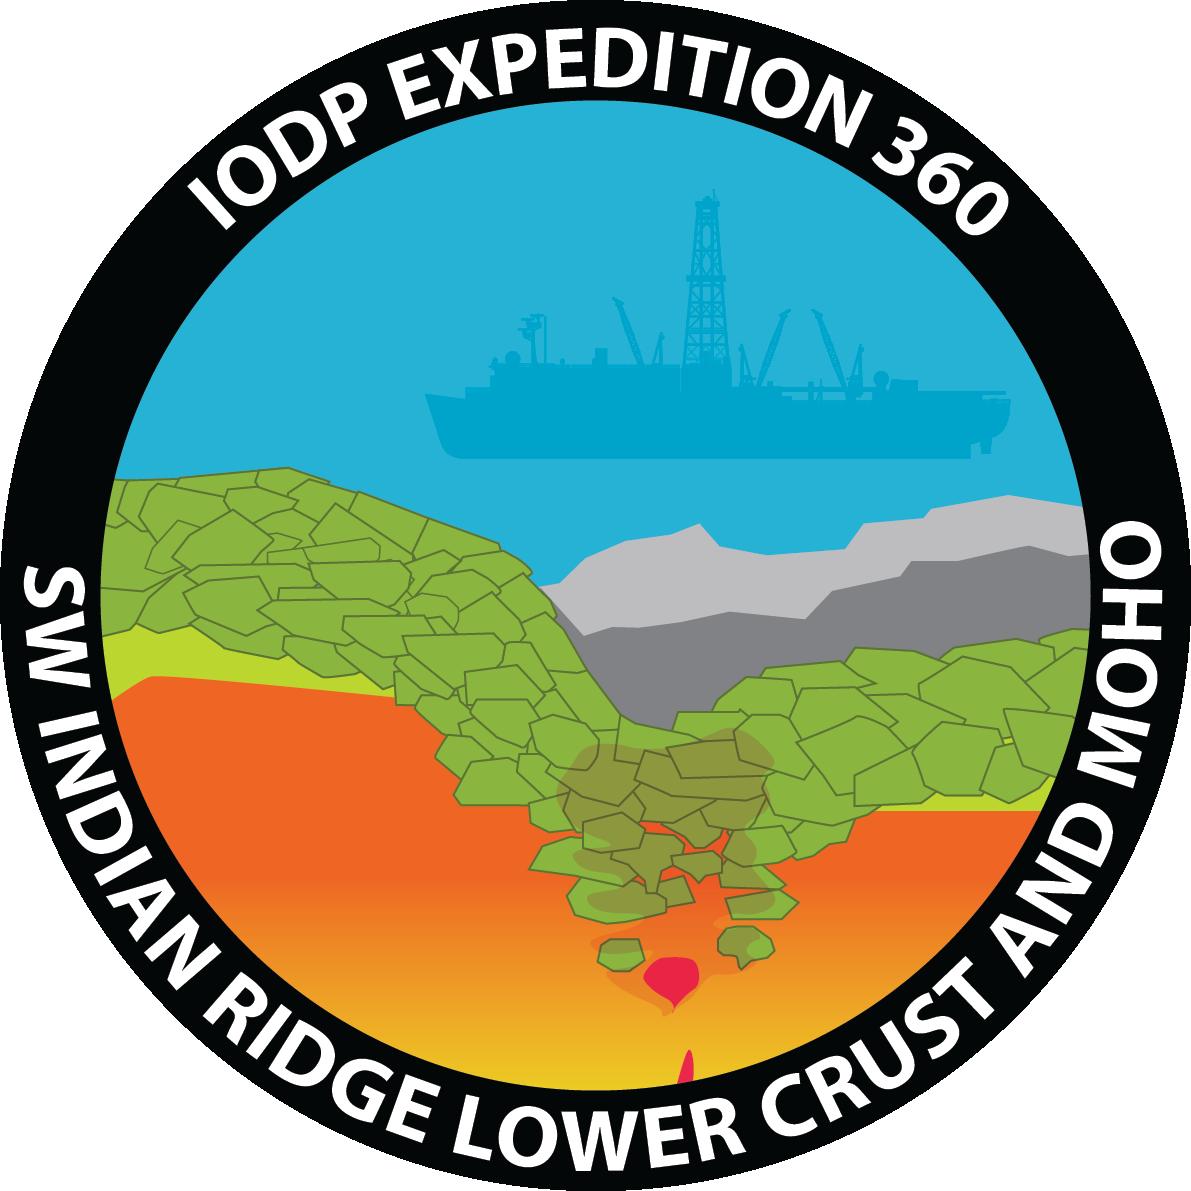 Clipart rock geophysics. Sw indian ridge joides